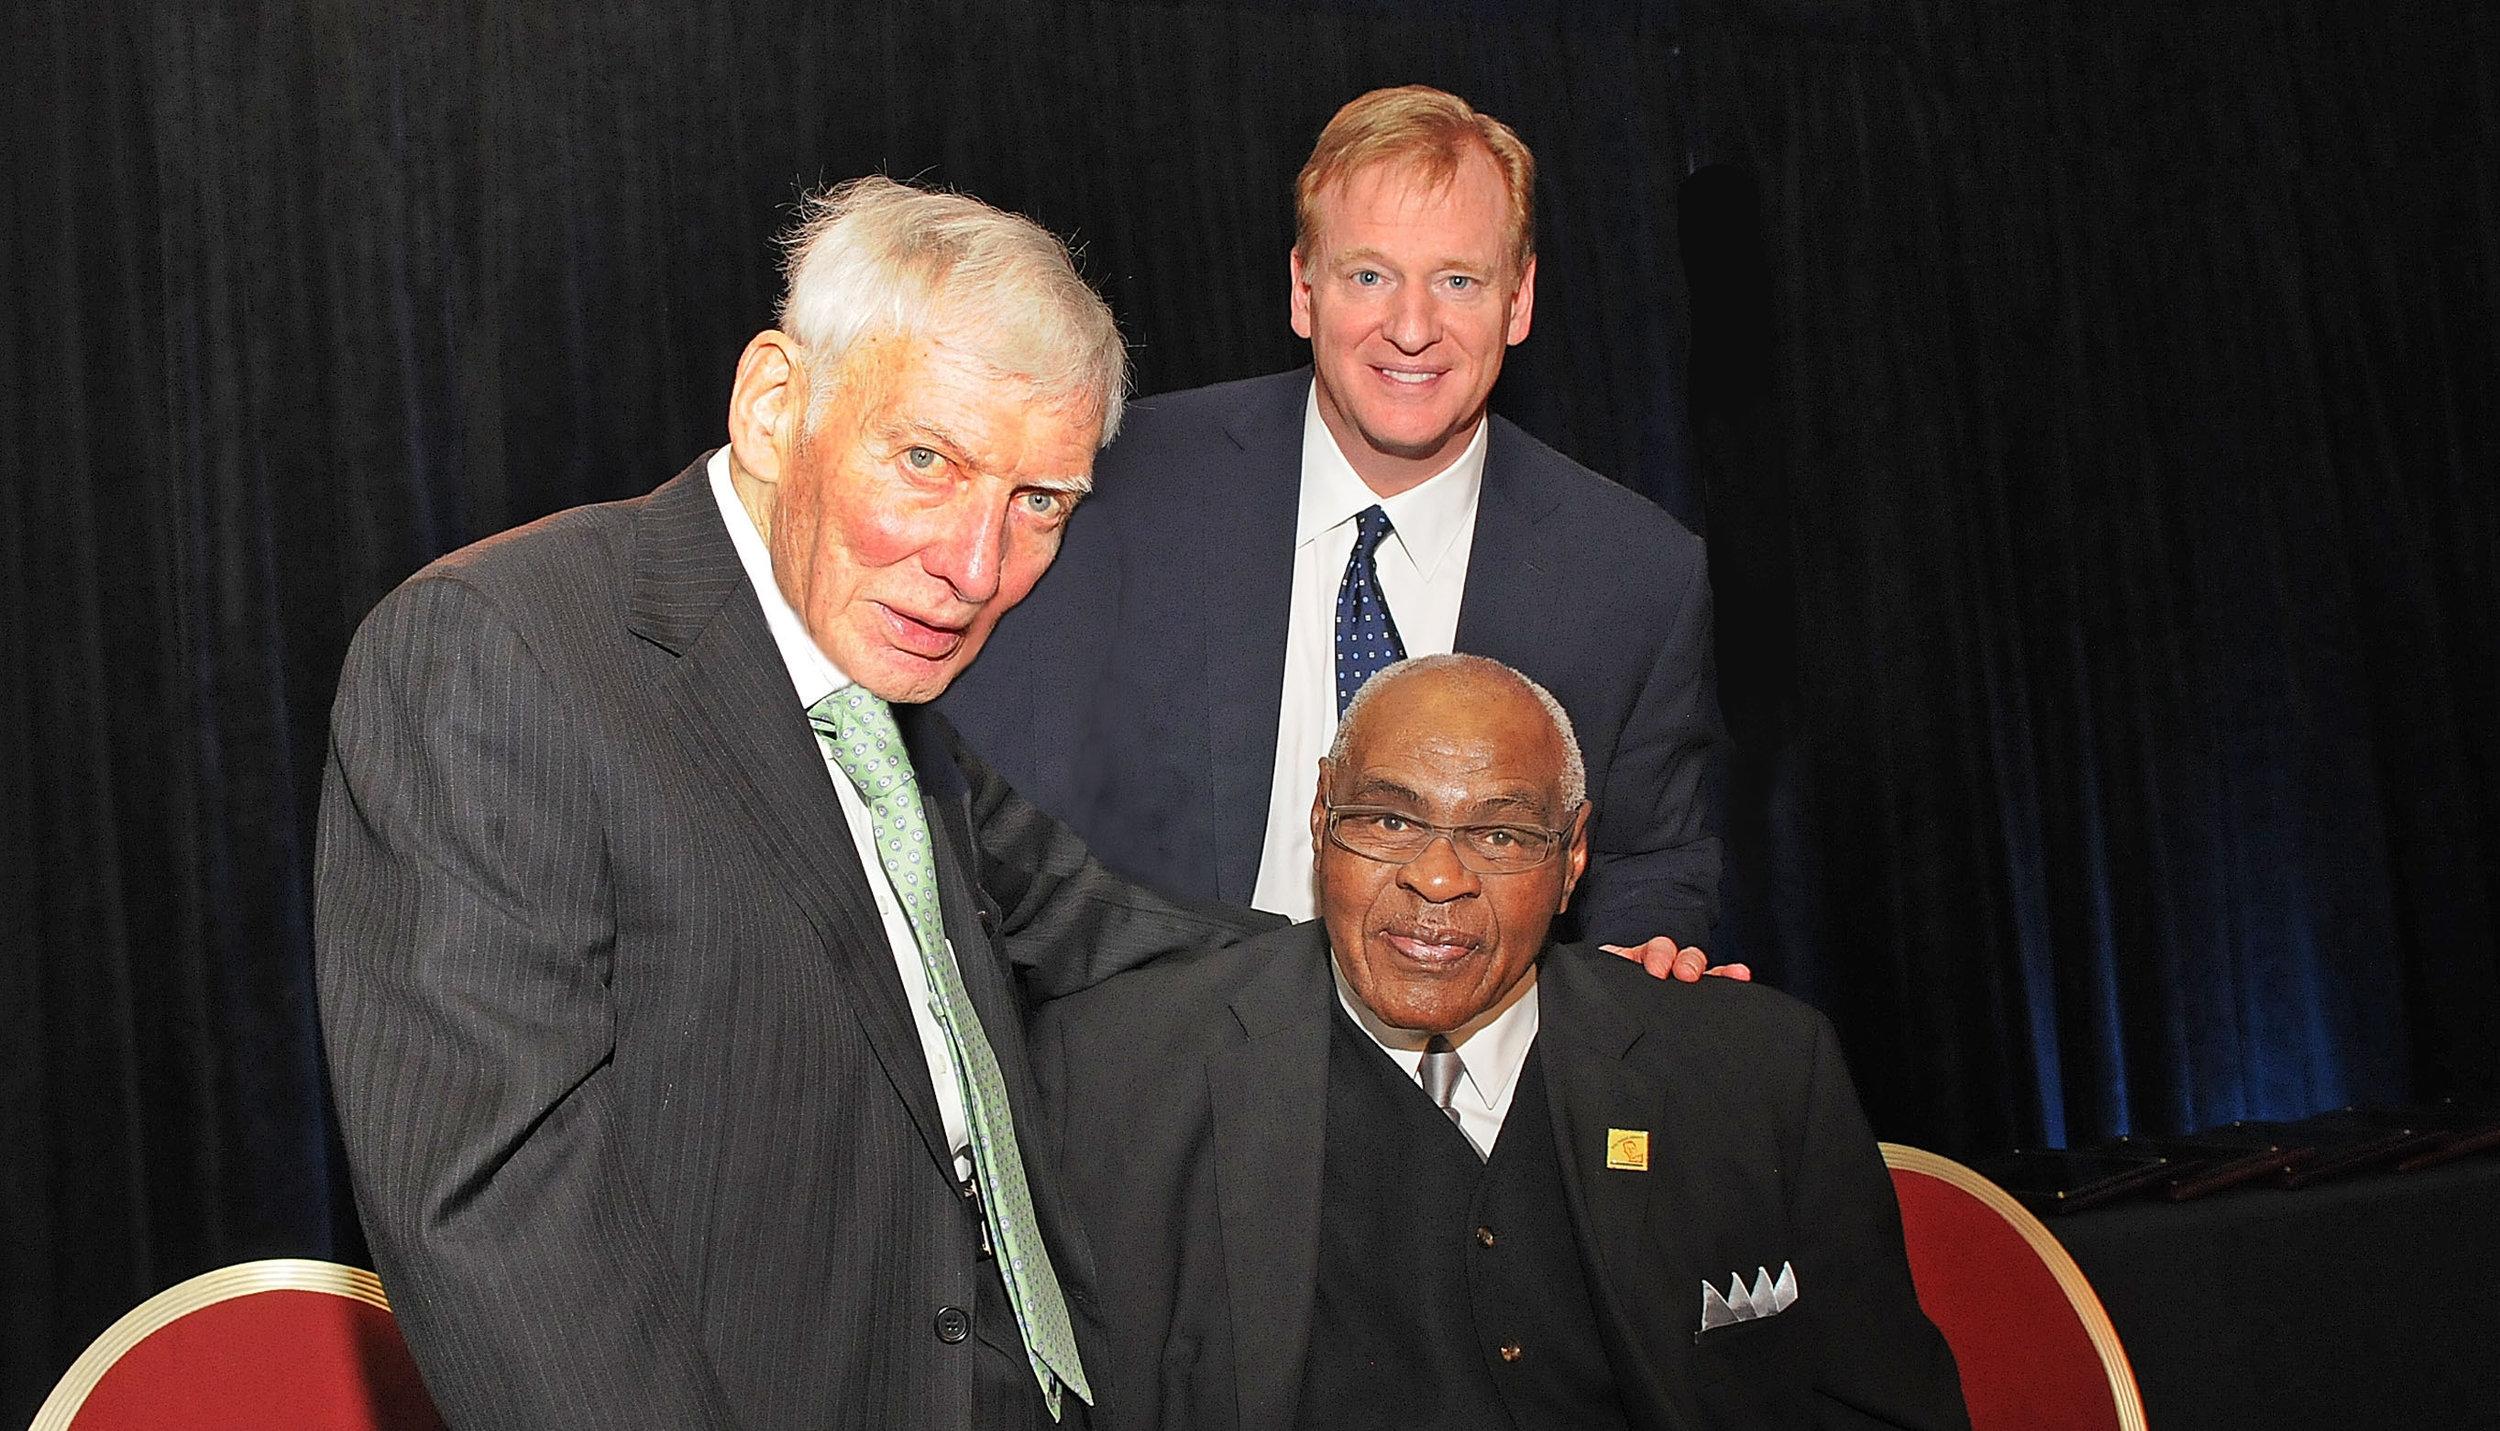 (Left to Right – Dan Rooney, Commissioner Roger Goodell; Seated: John Wooten)